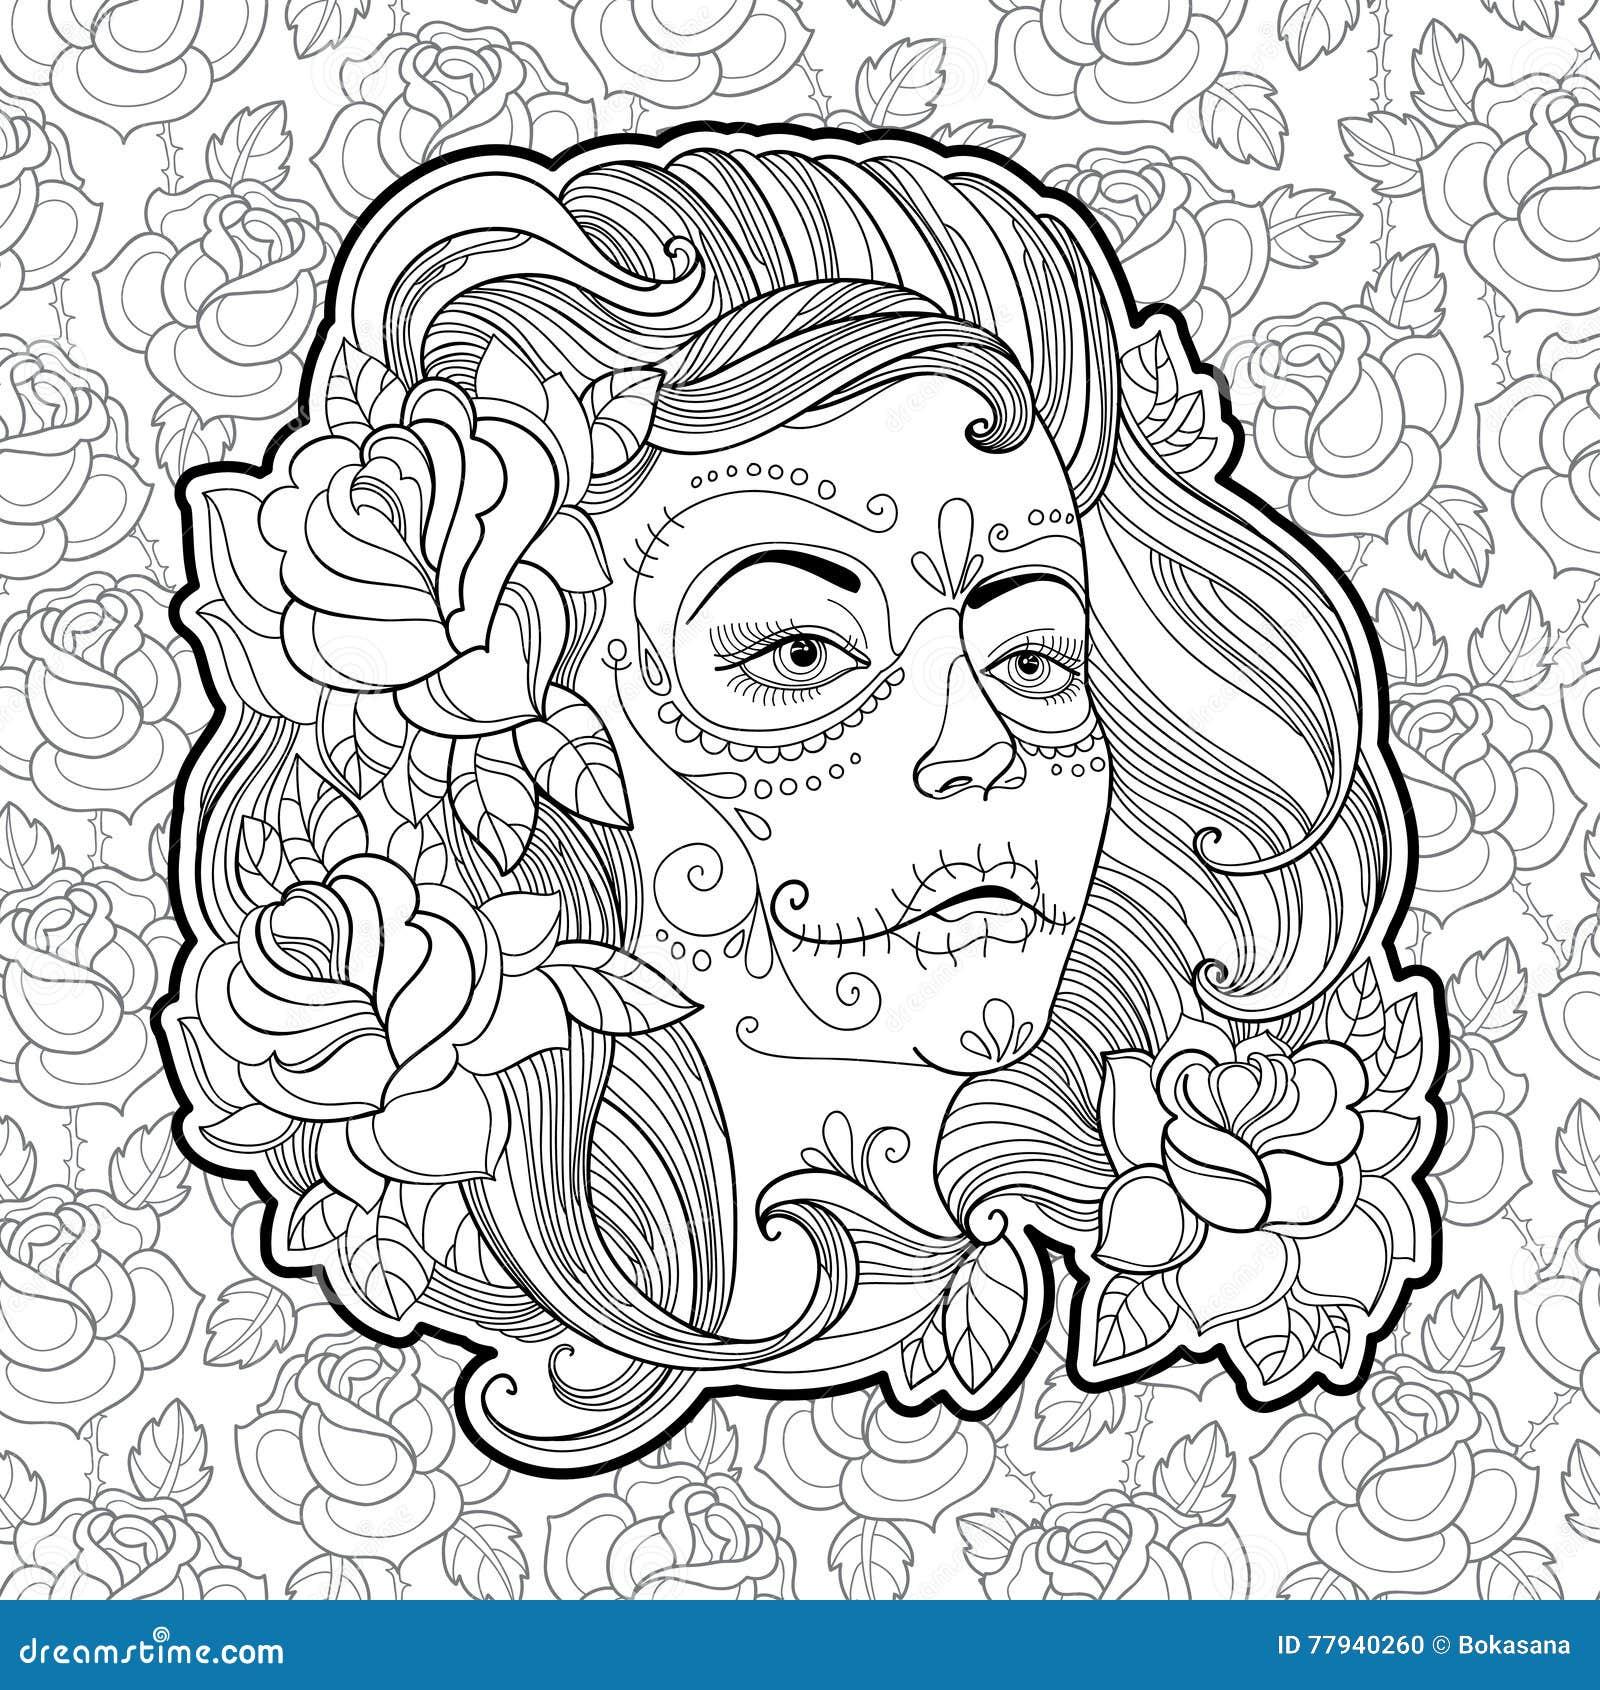 Woman Face With Sugar Skull Or Calavera Catrina Makeup On ...